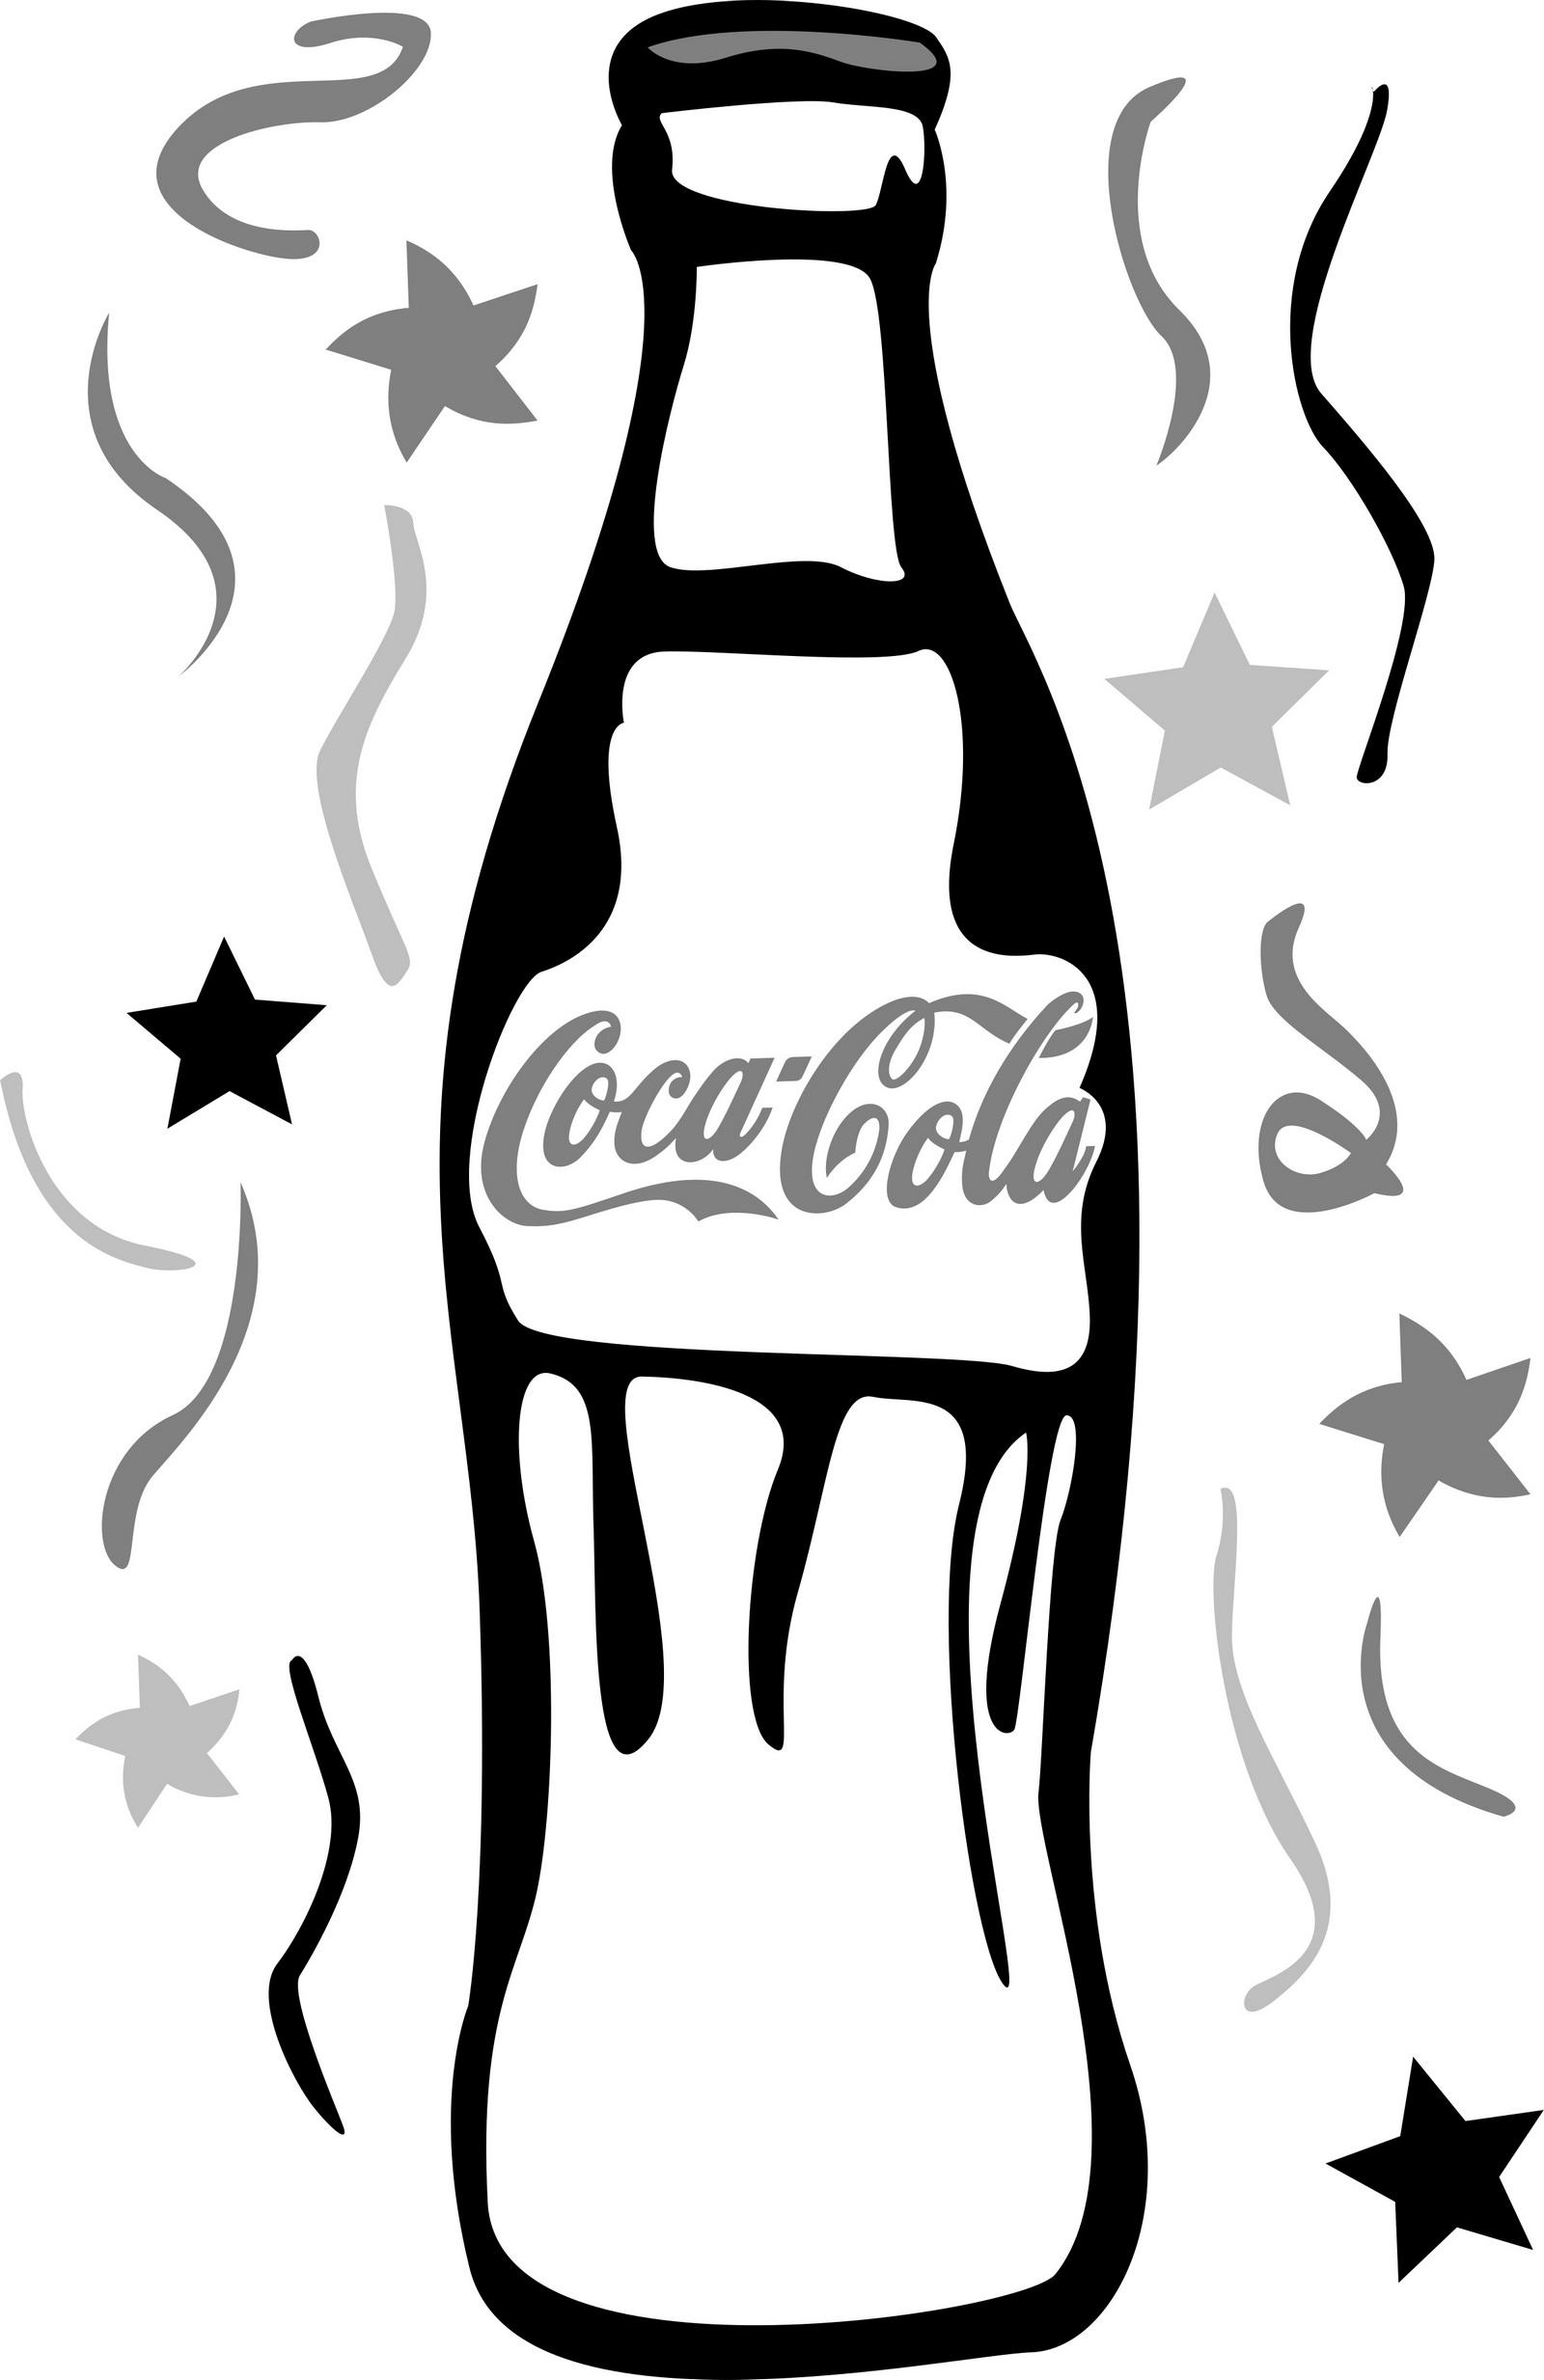 Coca Cola Bottle Coloring Page